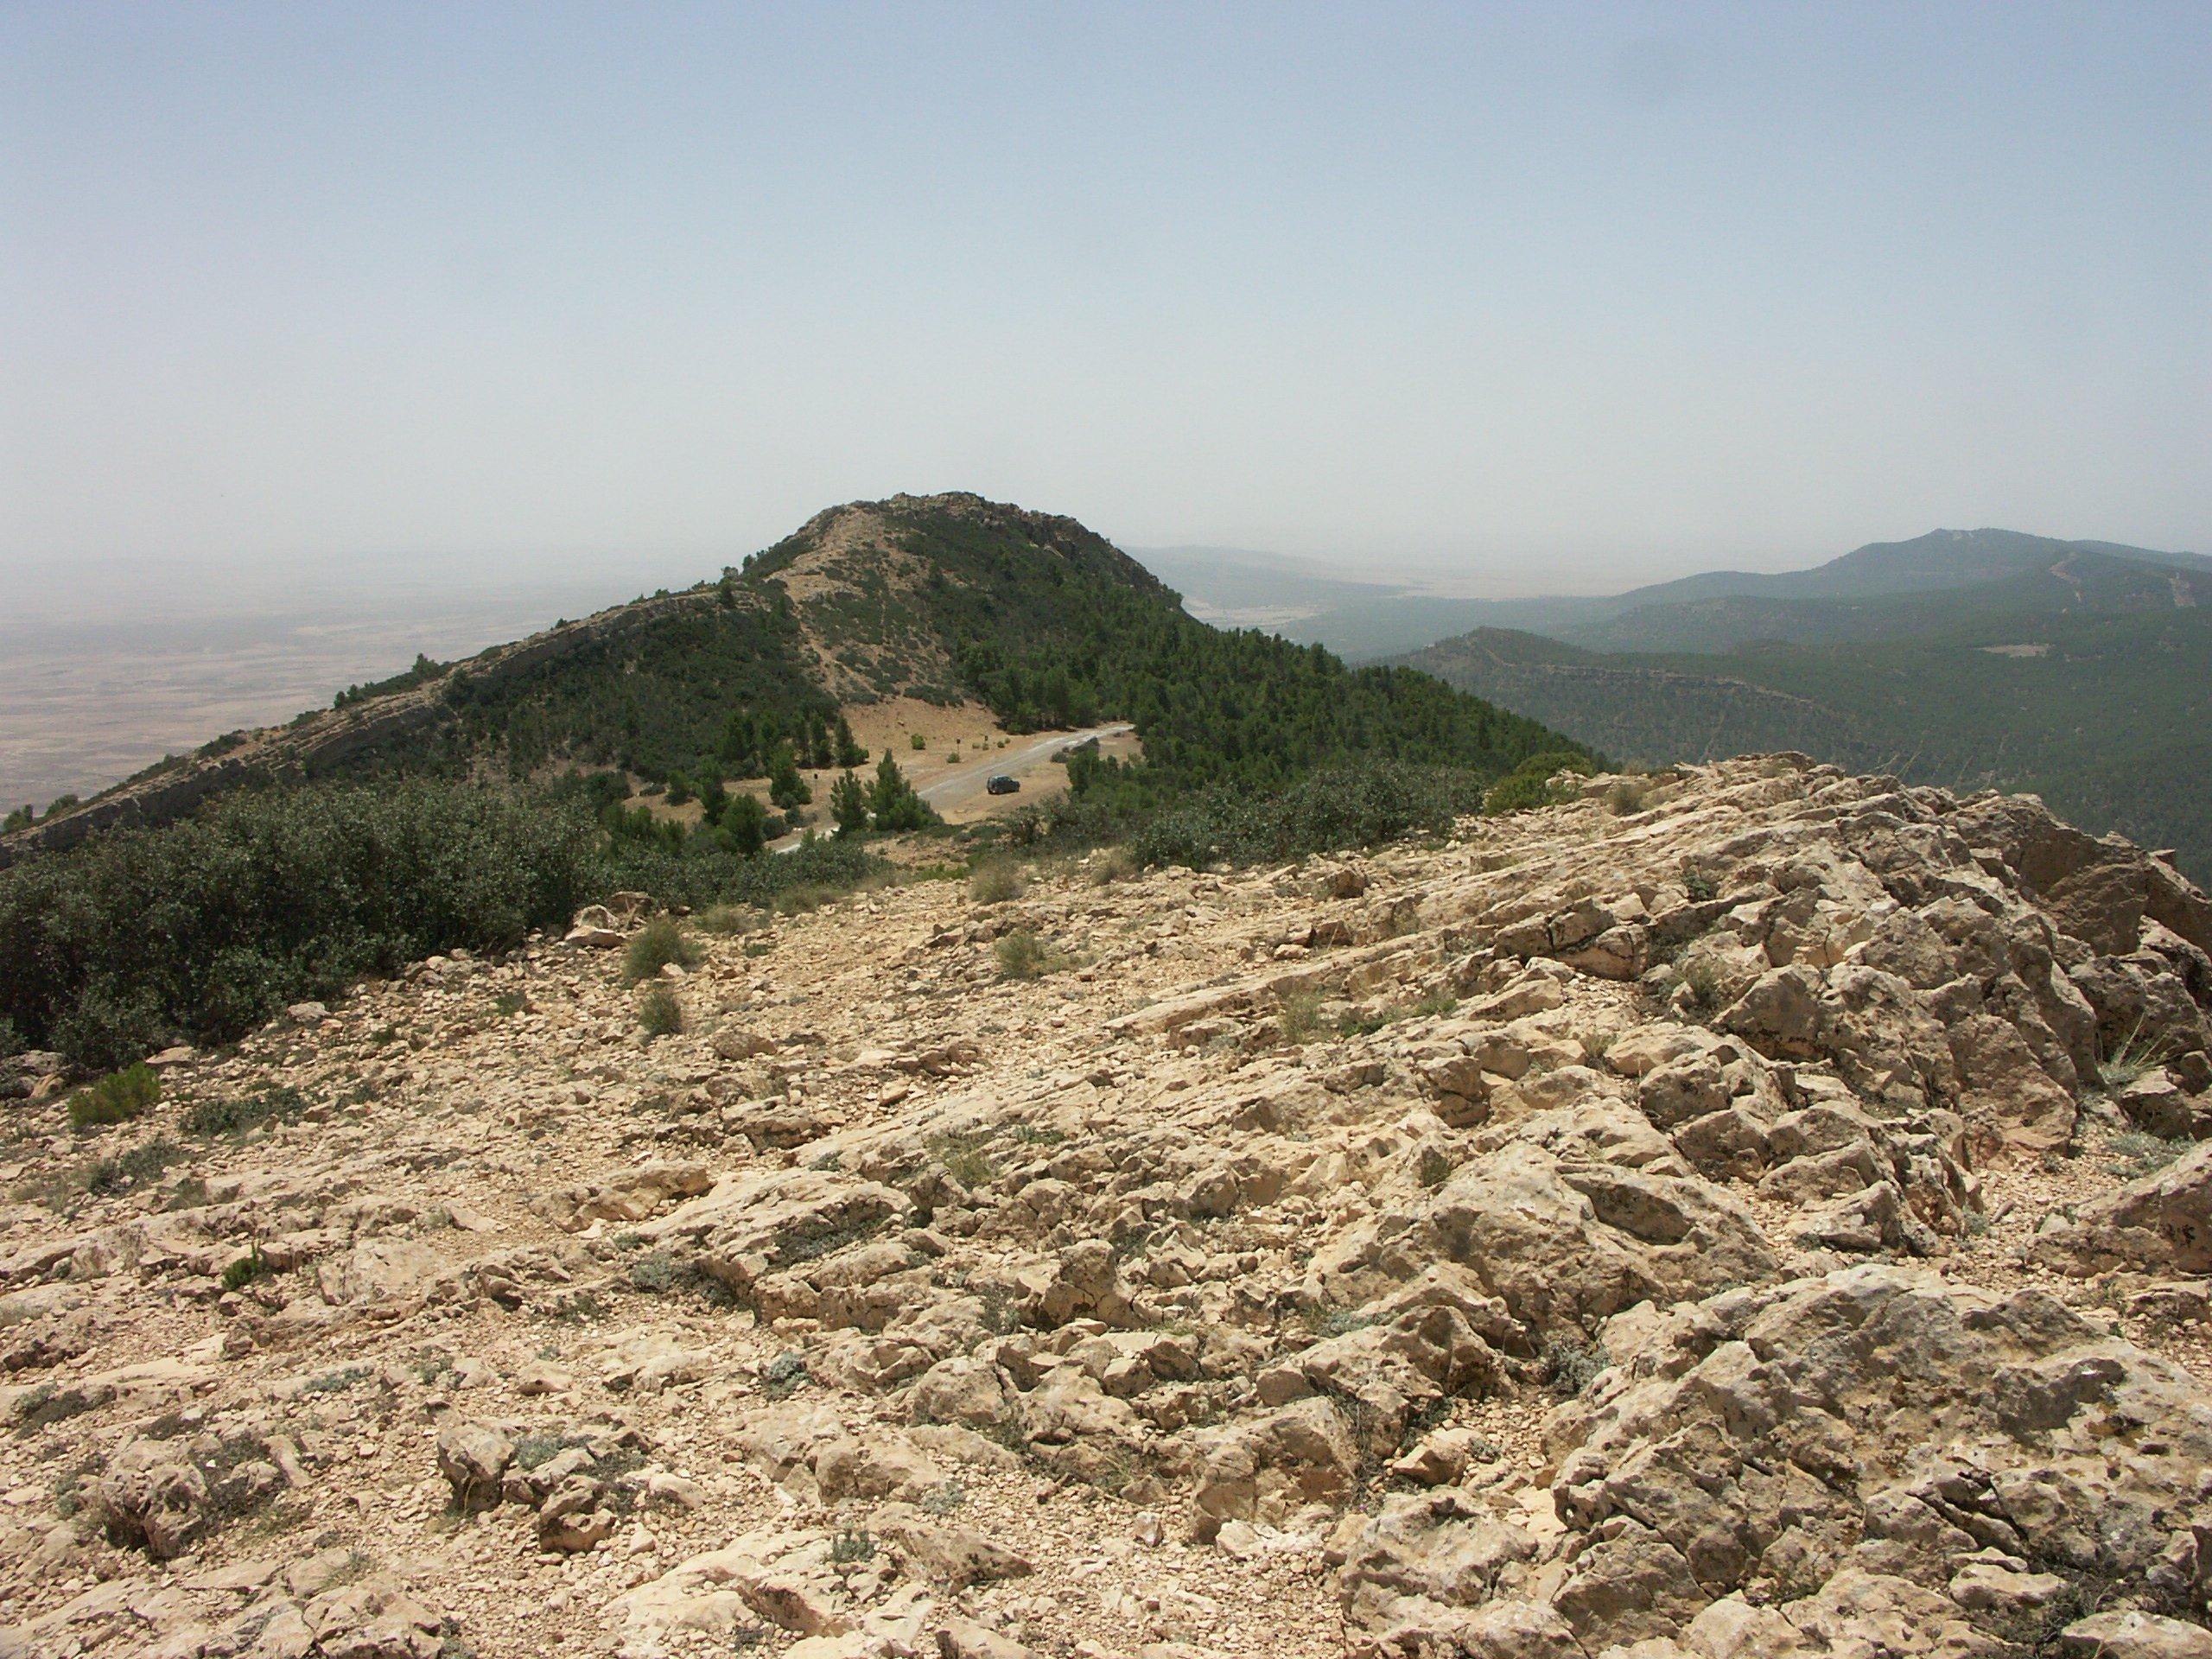 Chaambi National Park